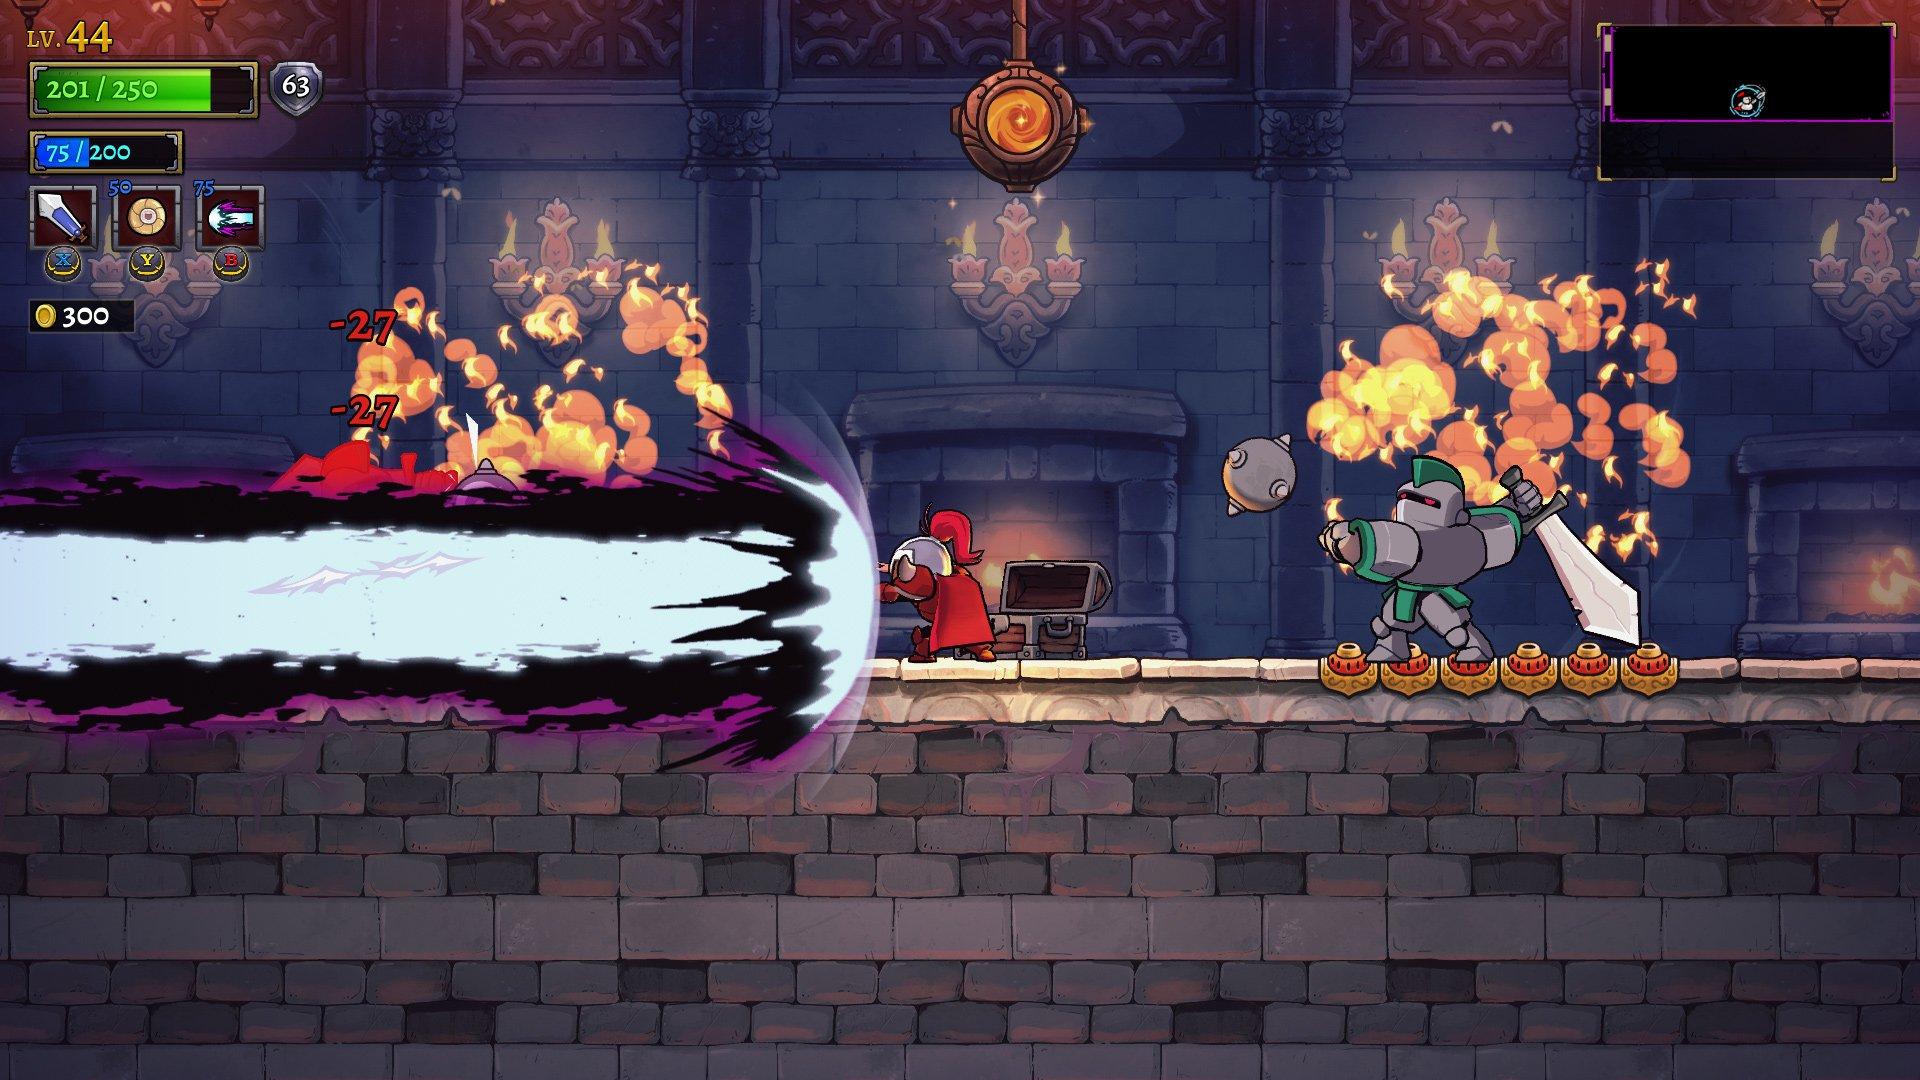 Spells look so flashy in Rogue Legacy 2